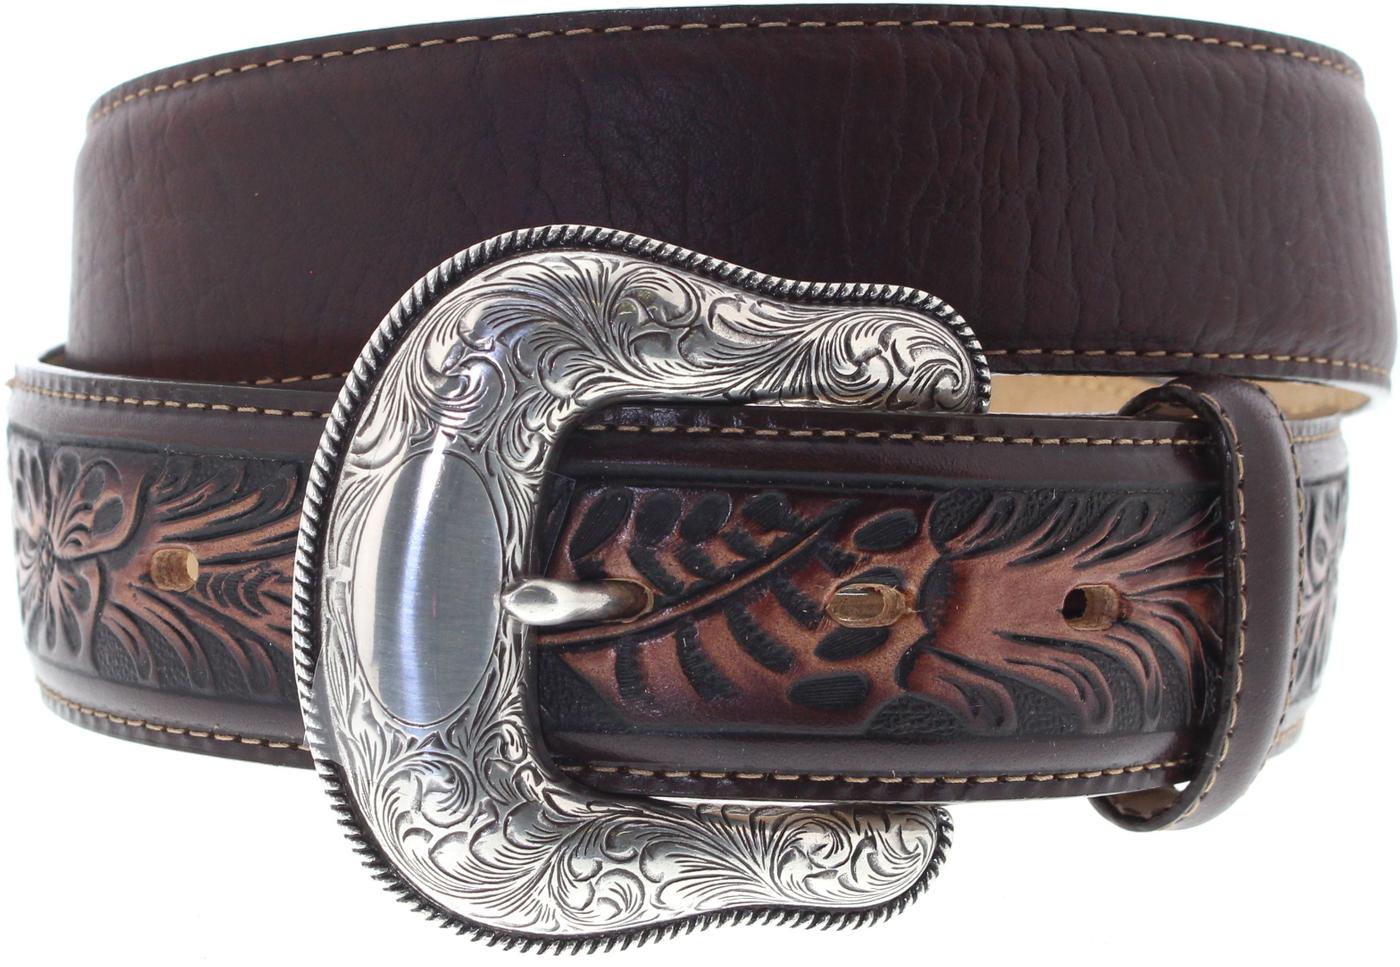 Justin Belts C13715 Brown The Montana Westerngürtel - braun